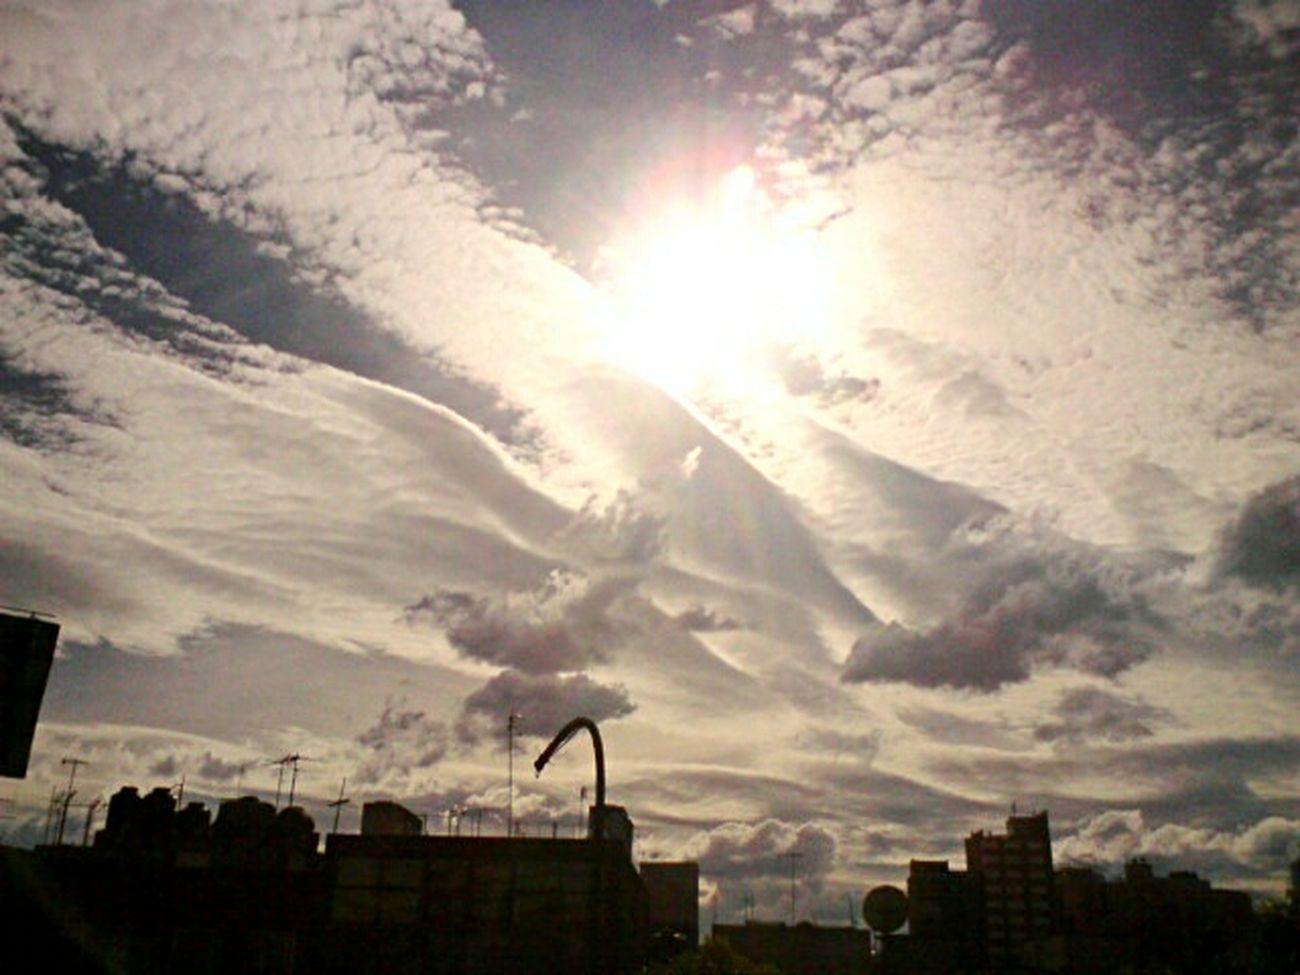 La mejor foto tomada por mi perspectiva. Febrero2012 Aves Nubes Urbanphotography Photography Bestphoto Sky